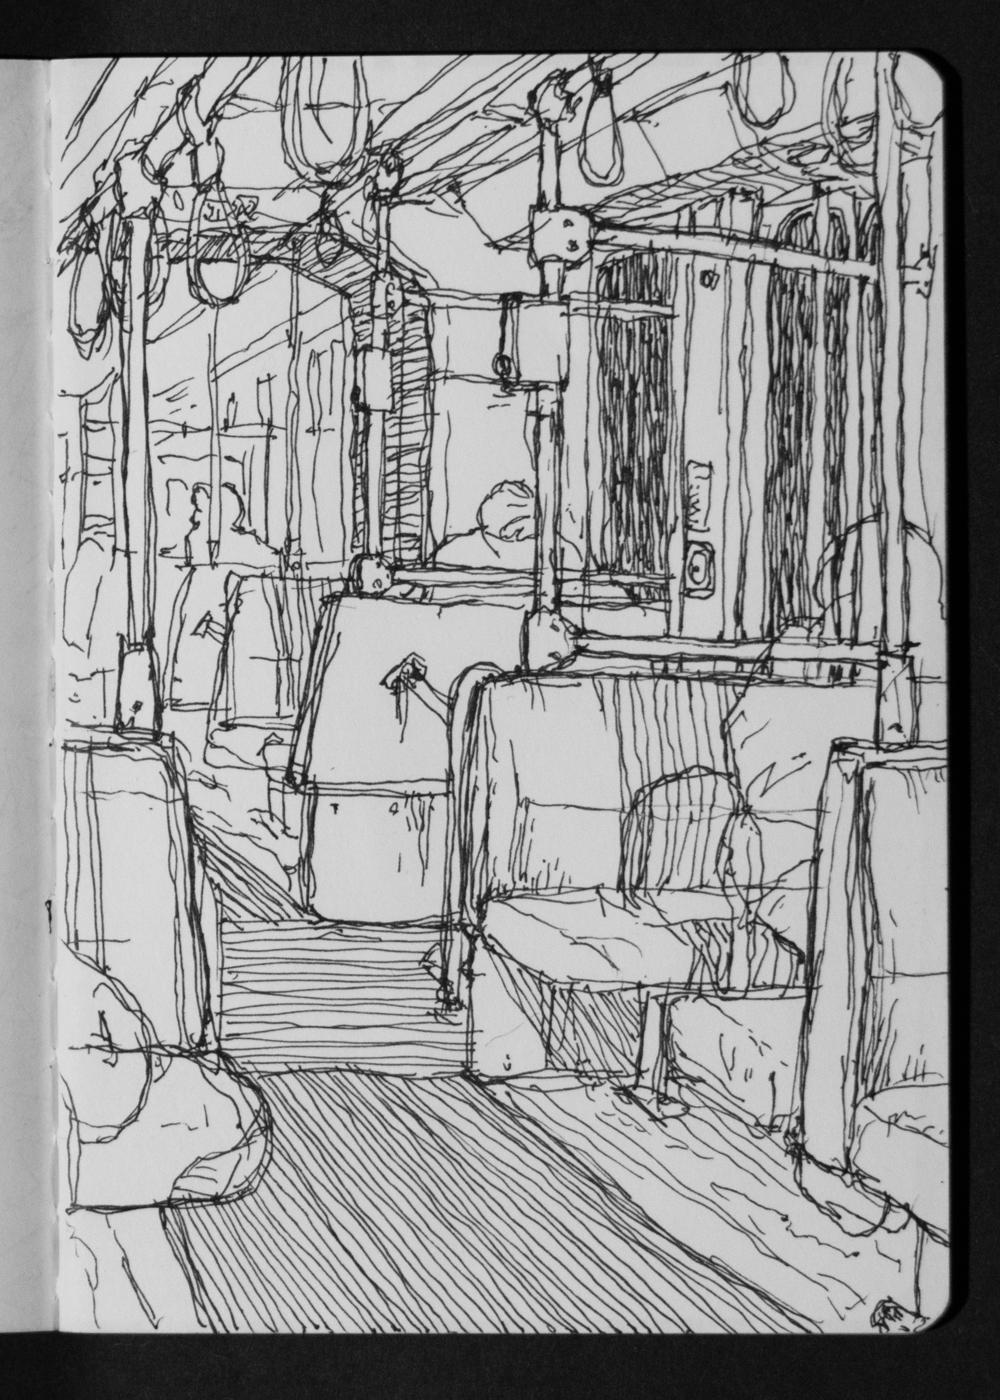 04-02 Lightrail W Line.jpg